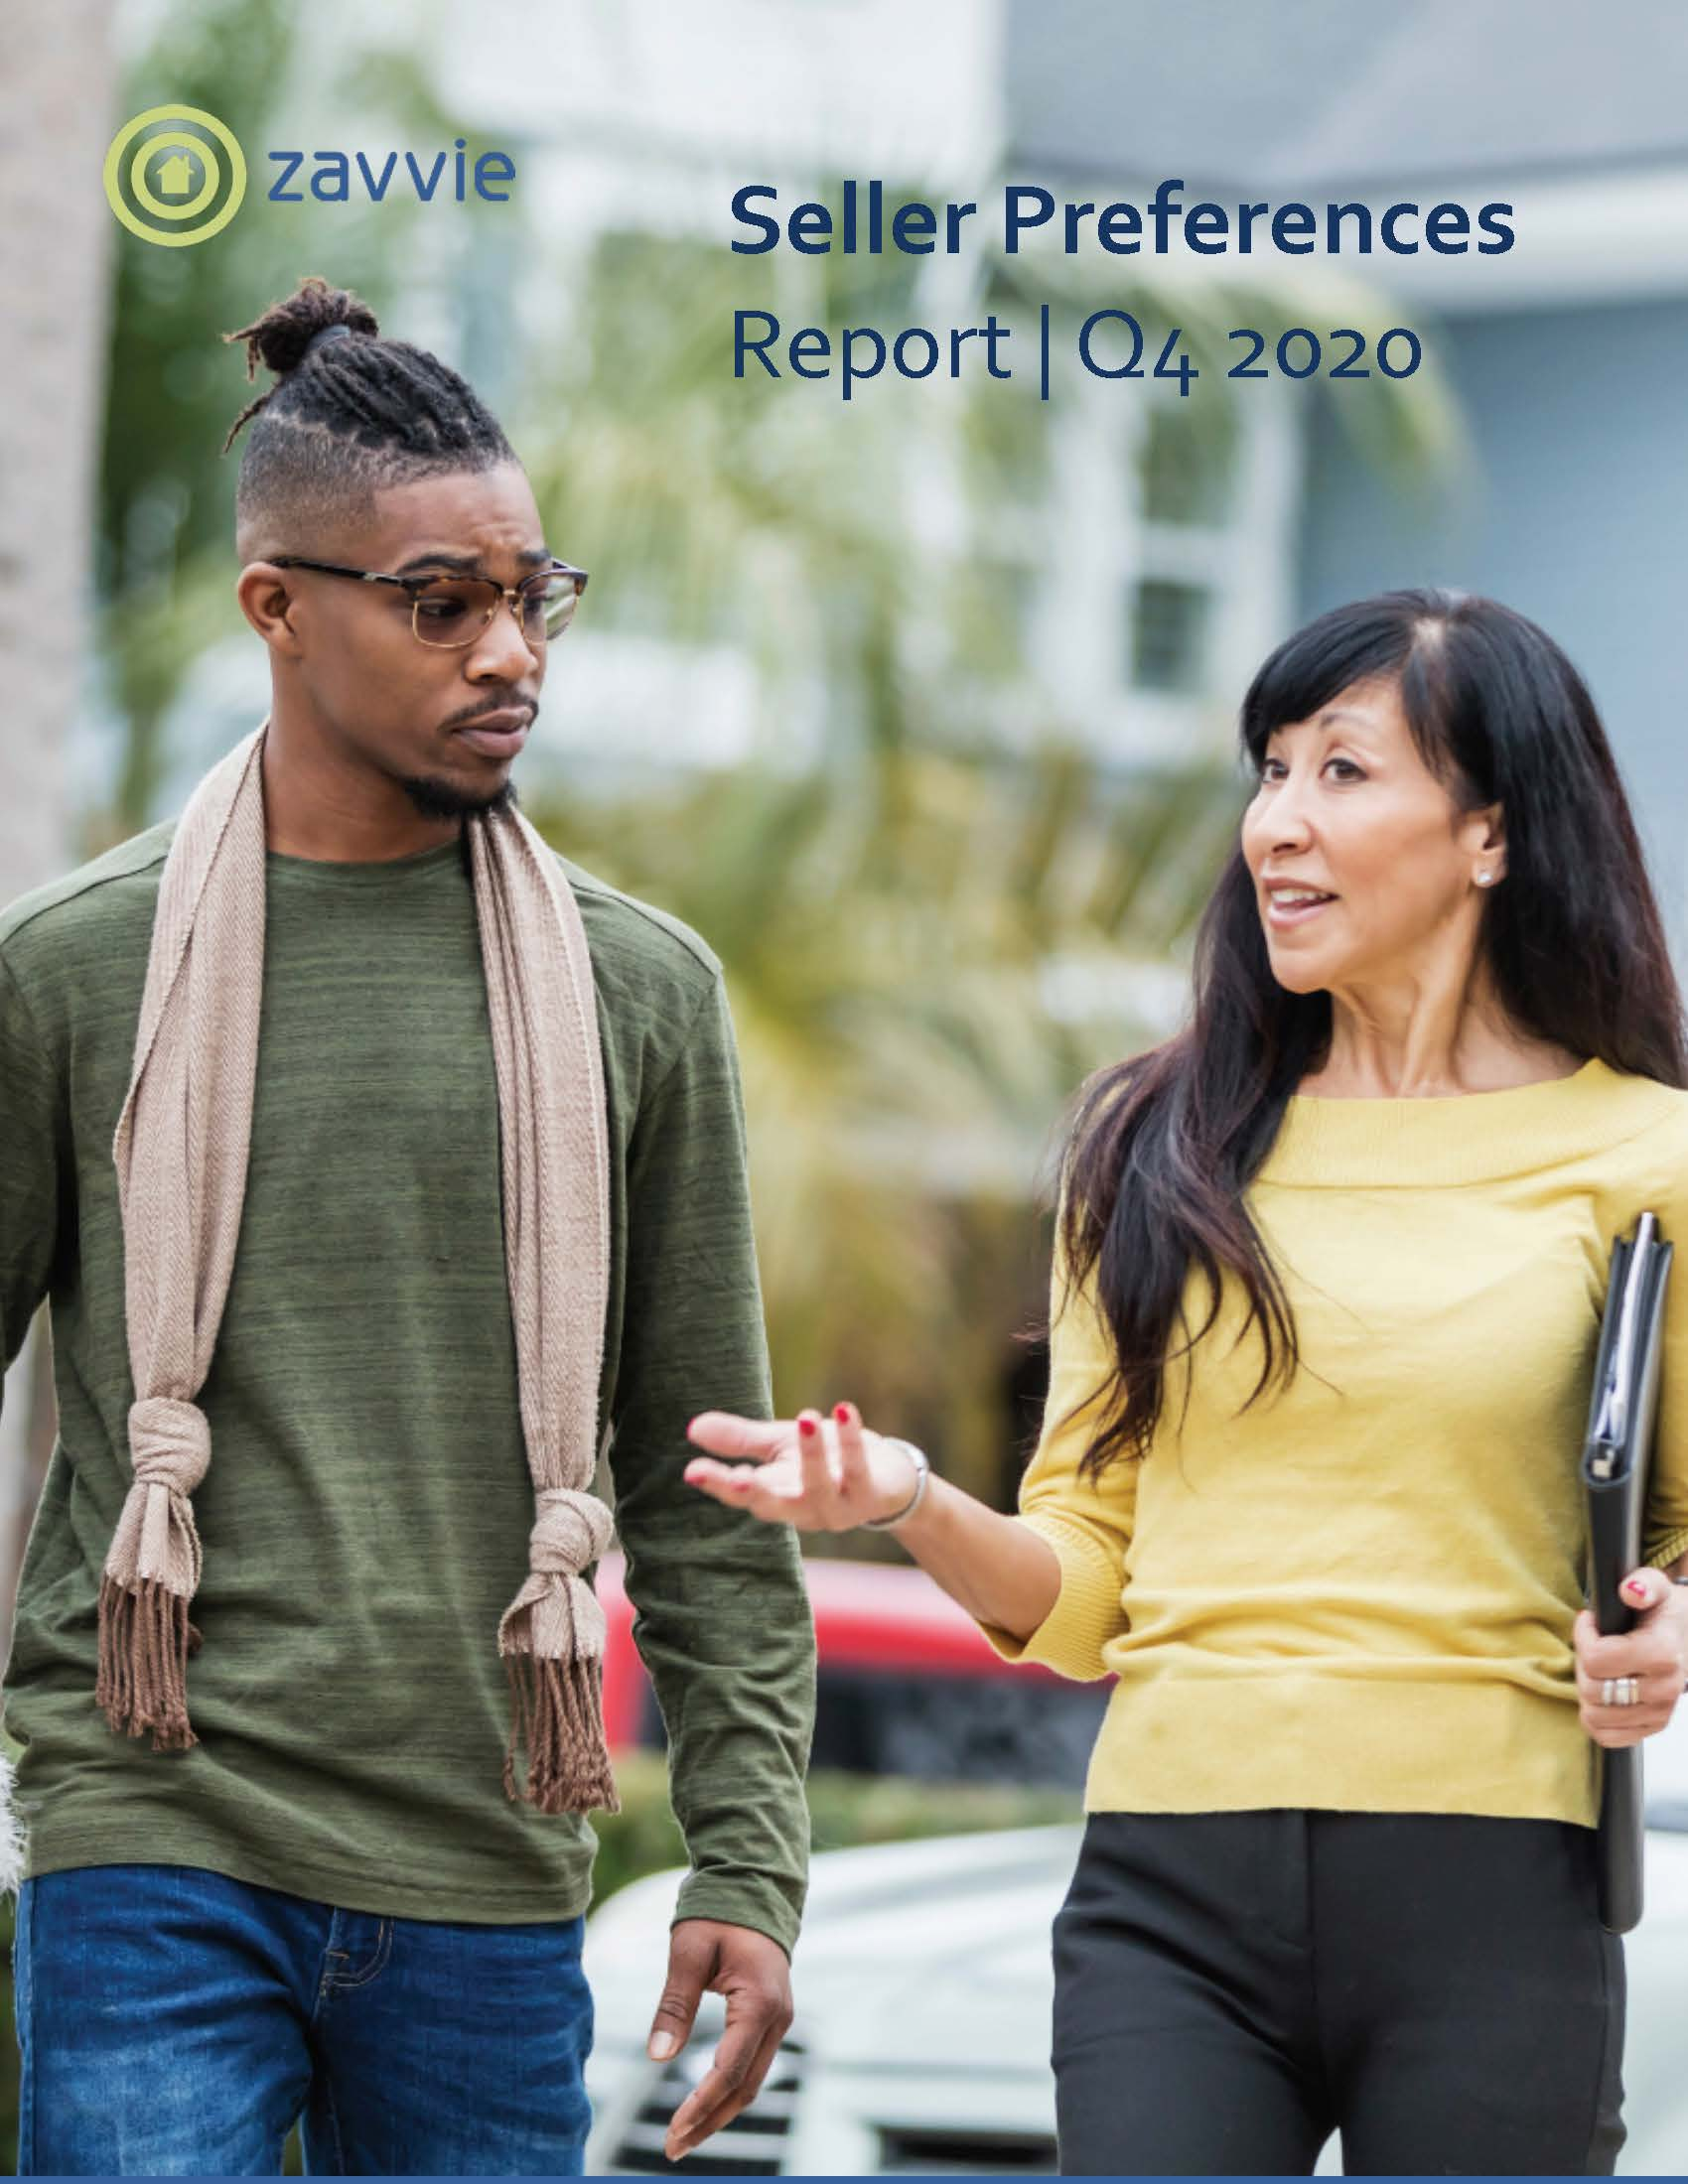 zavvie seller preferences report